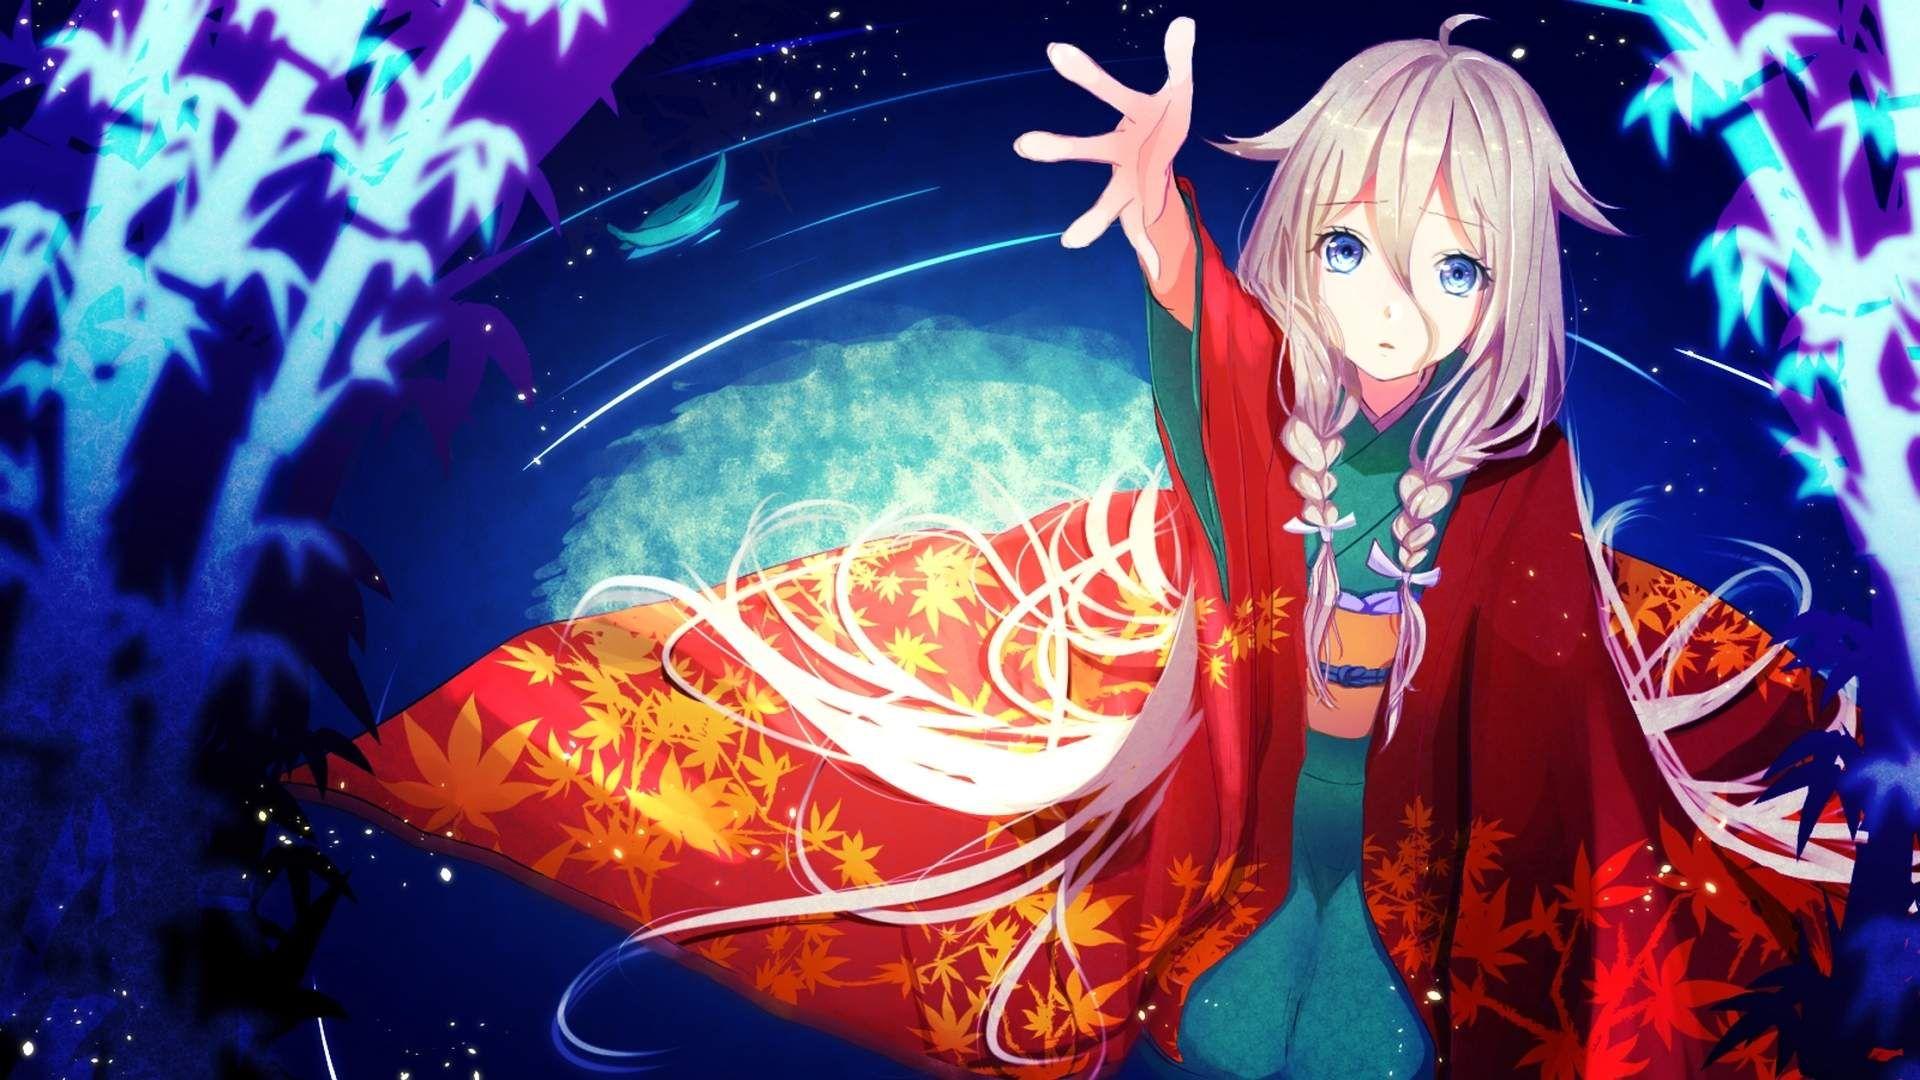 Anime Wallpaper & Anime Girls HD Wallpapers Best